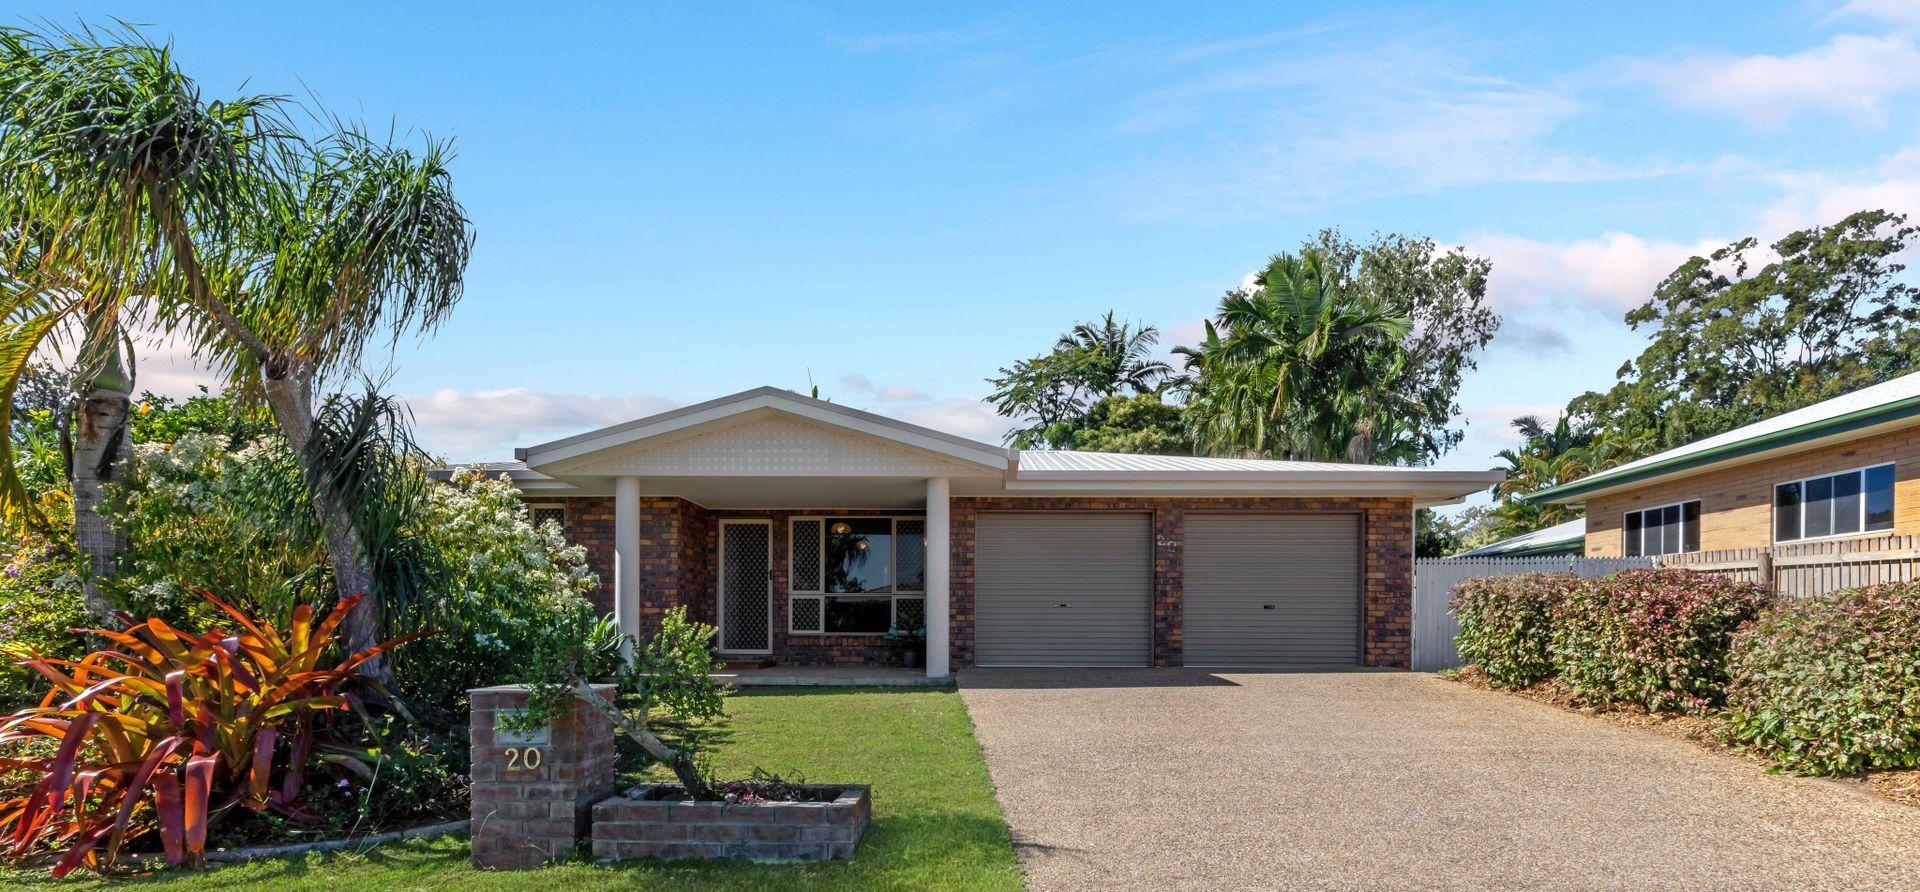 20 Broomdykes Drive, Beaconsfield QLD 4740, Image 1